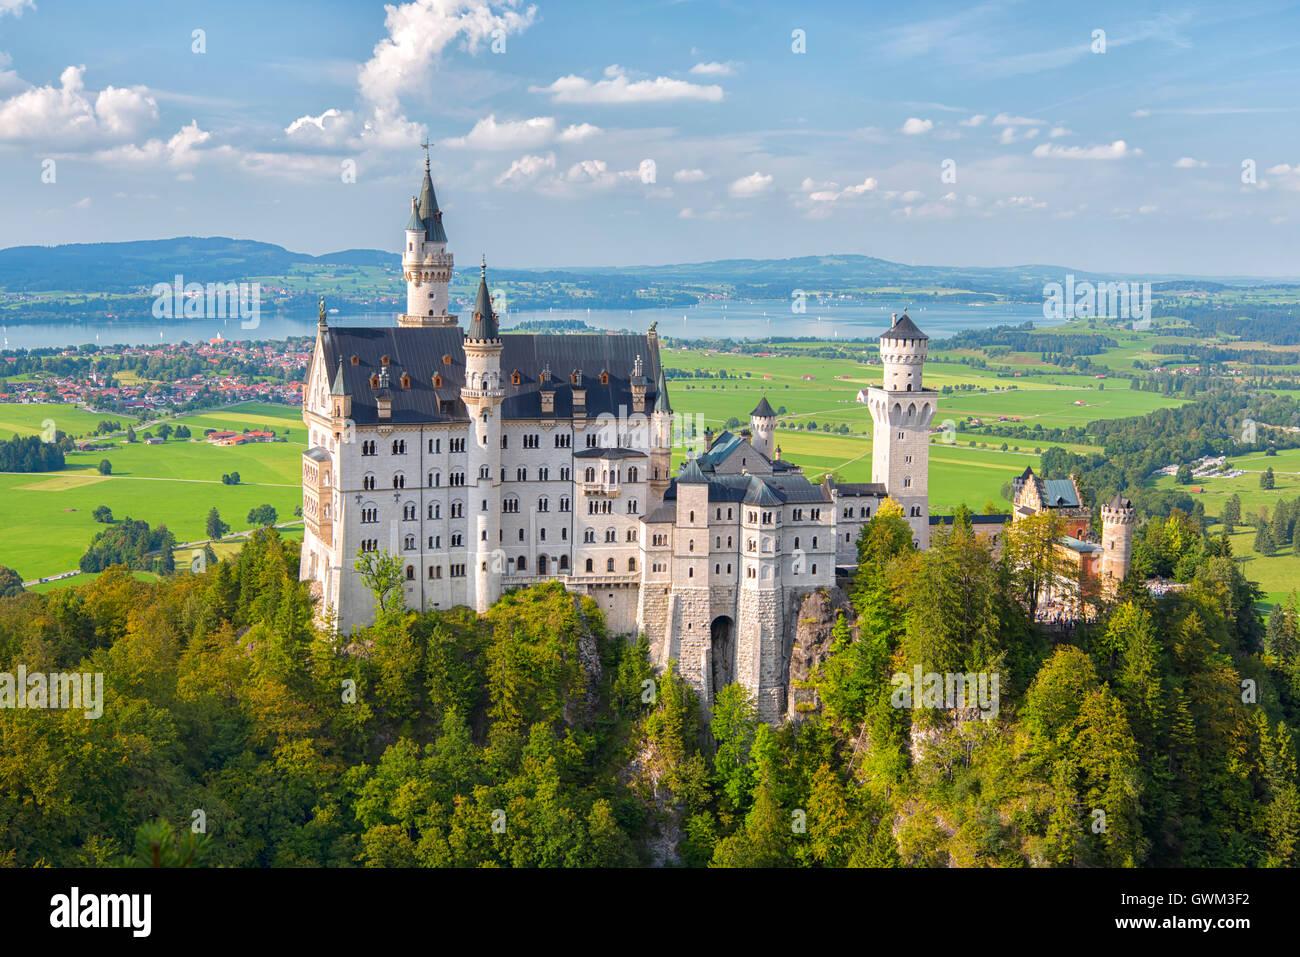 Neuschwanstein Castle in Hohenschwangau, Germany - Stock Image